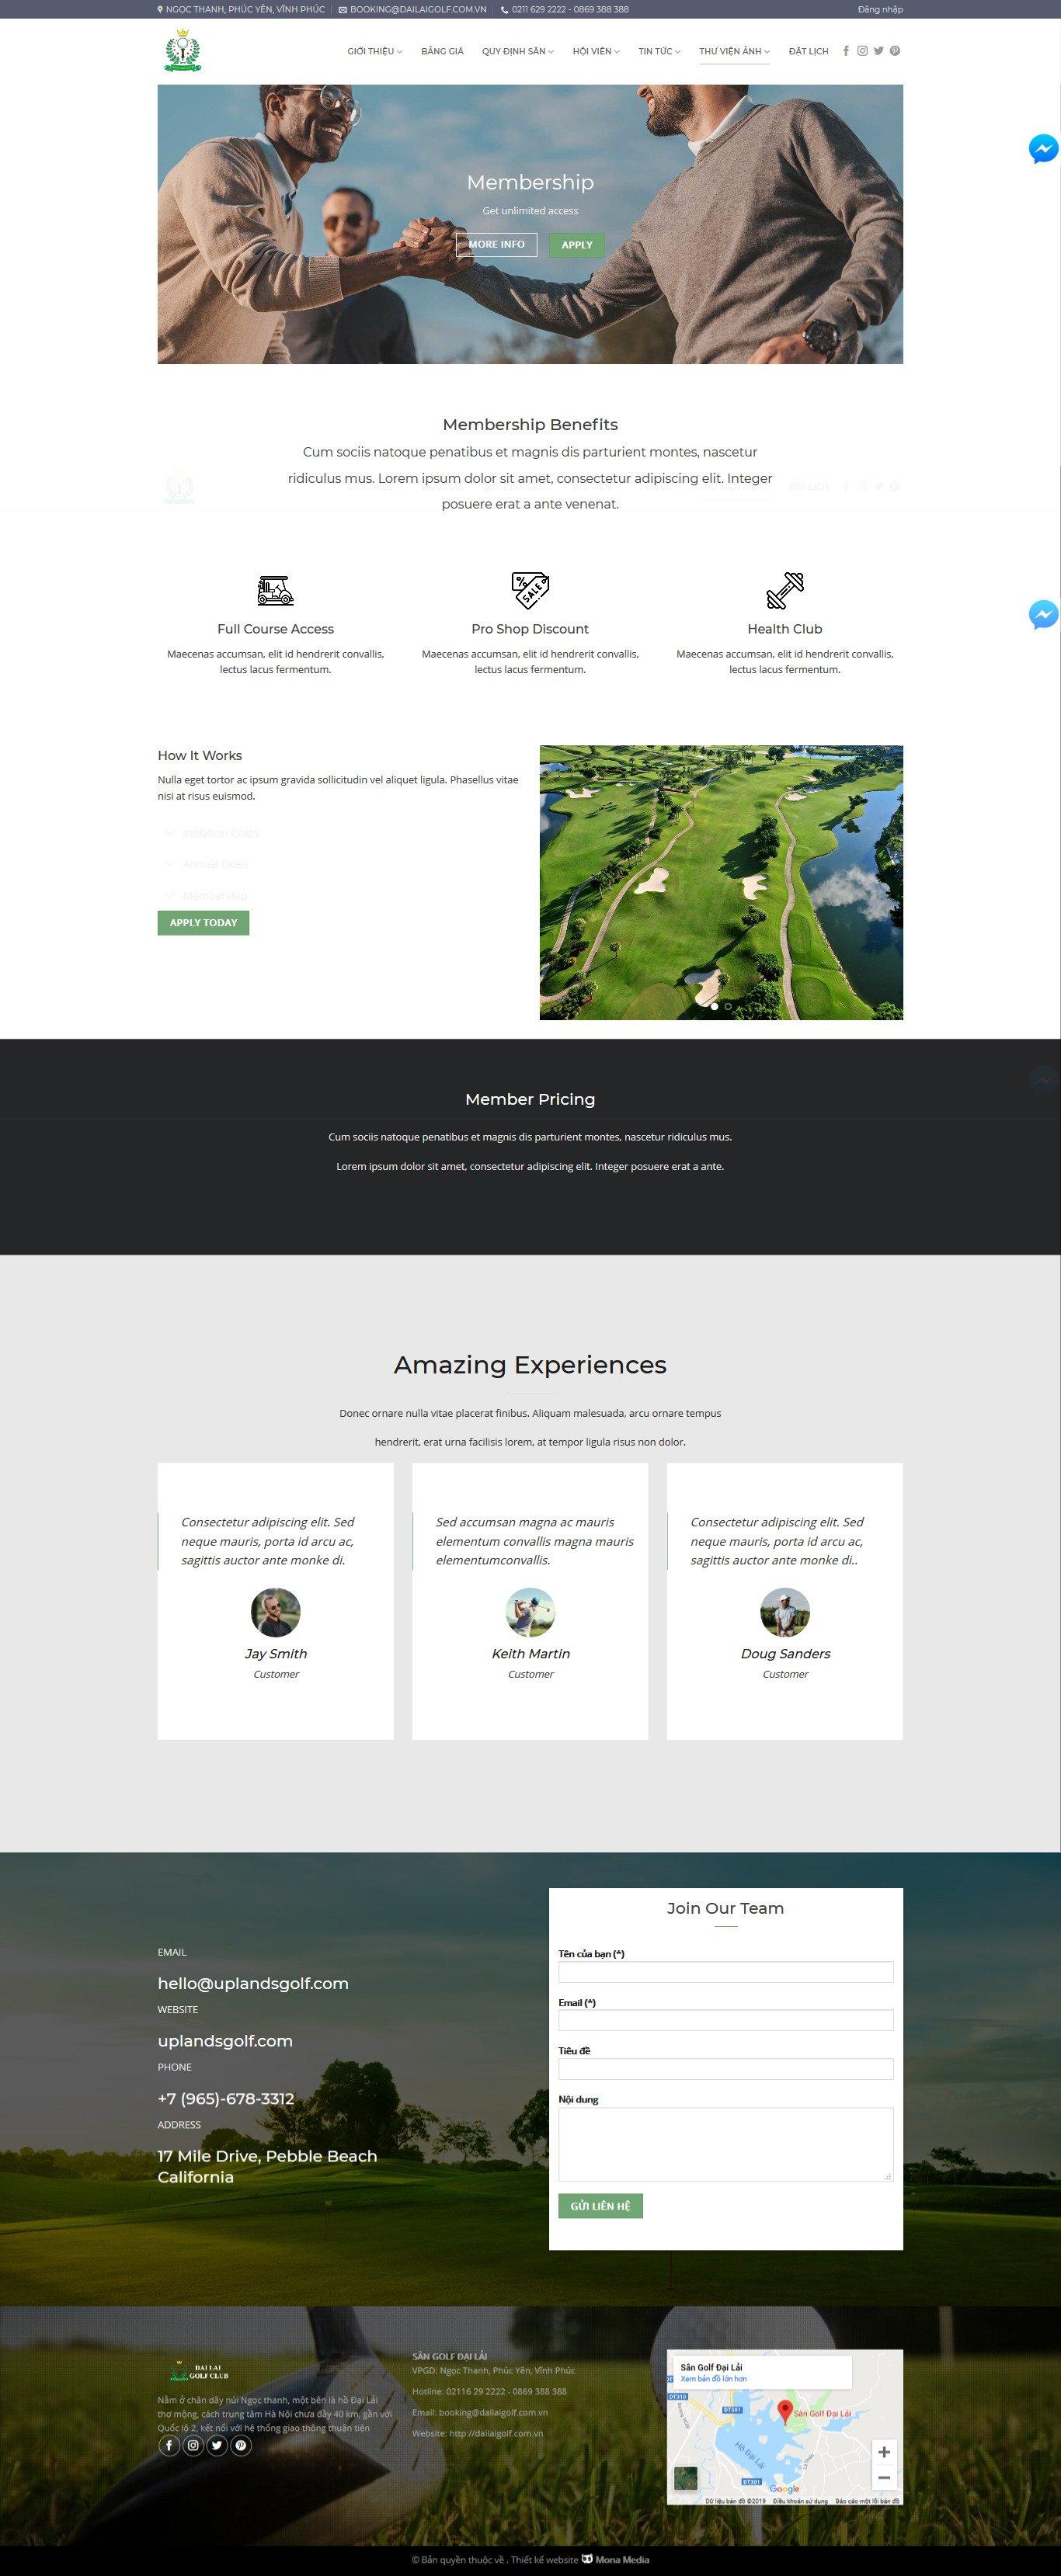 Mẫu website giới thiệu sân golf